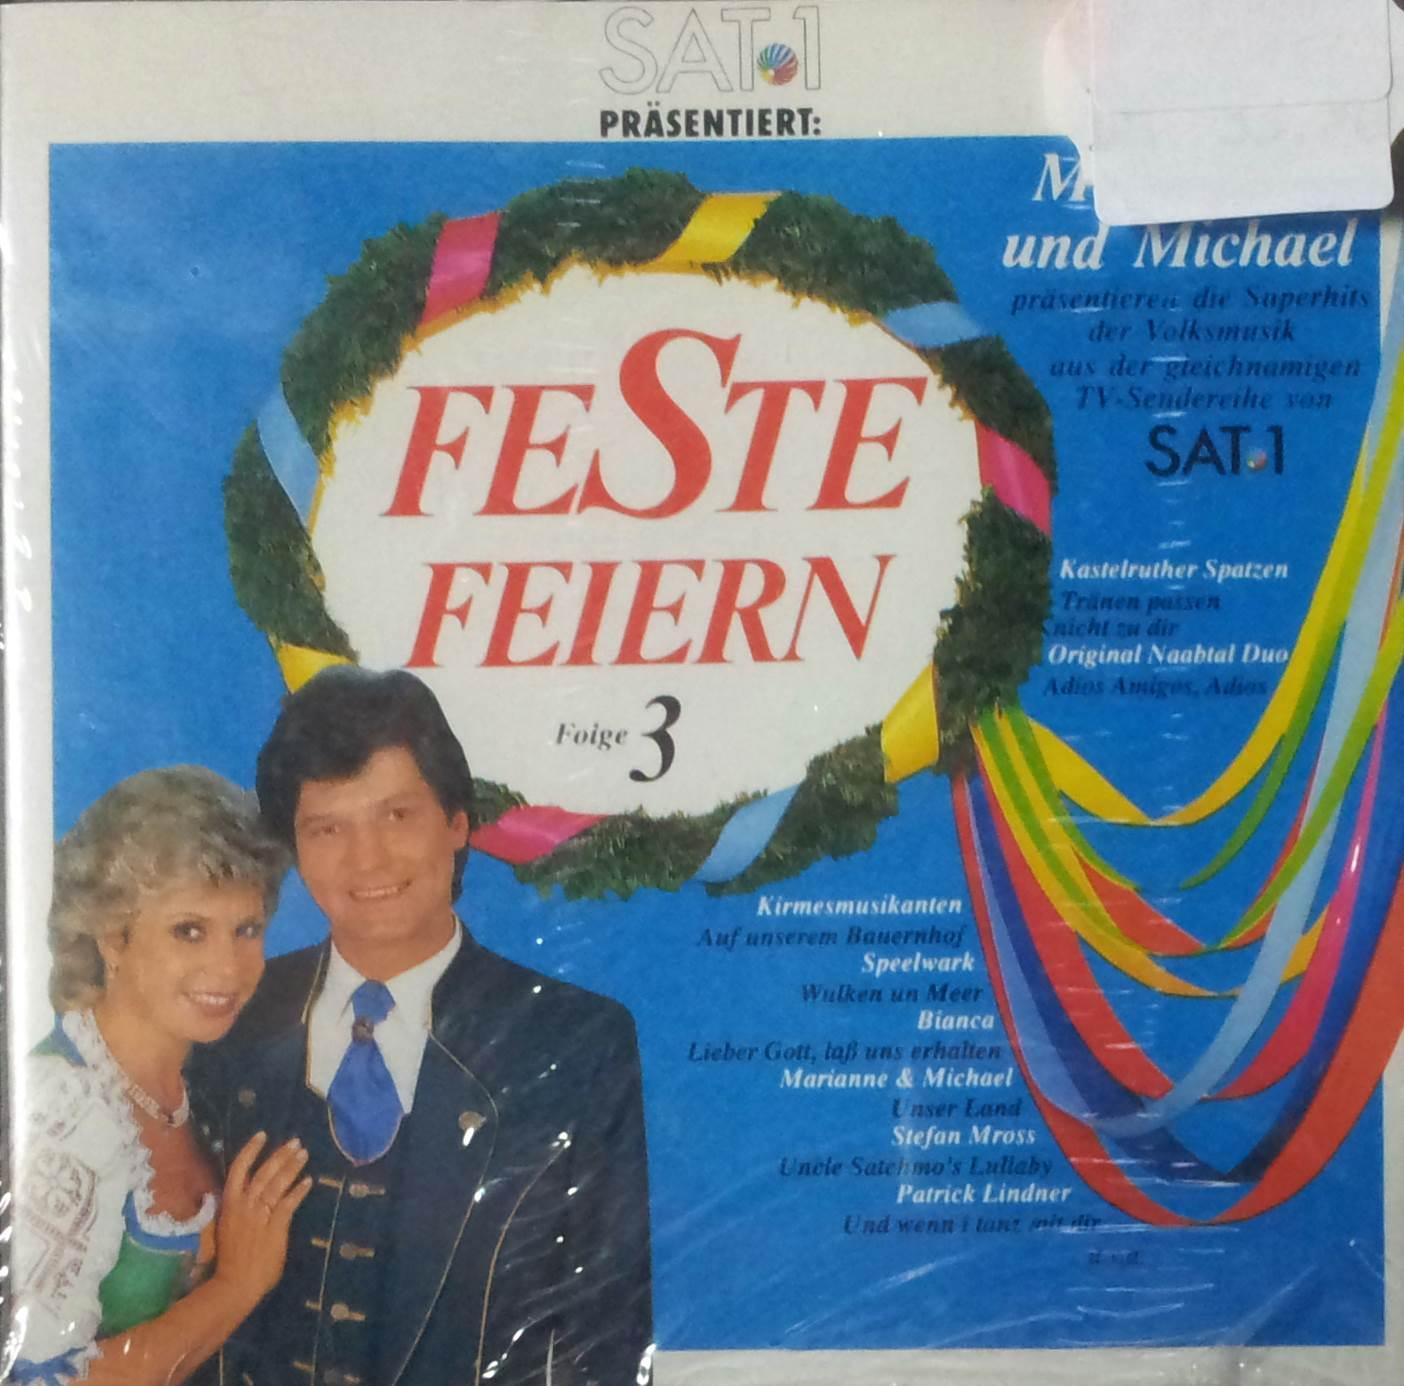 Feste feiern - Folge 3 - Marianne & Michael präsentieren